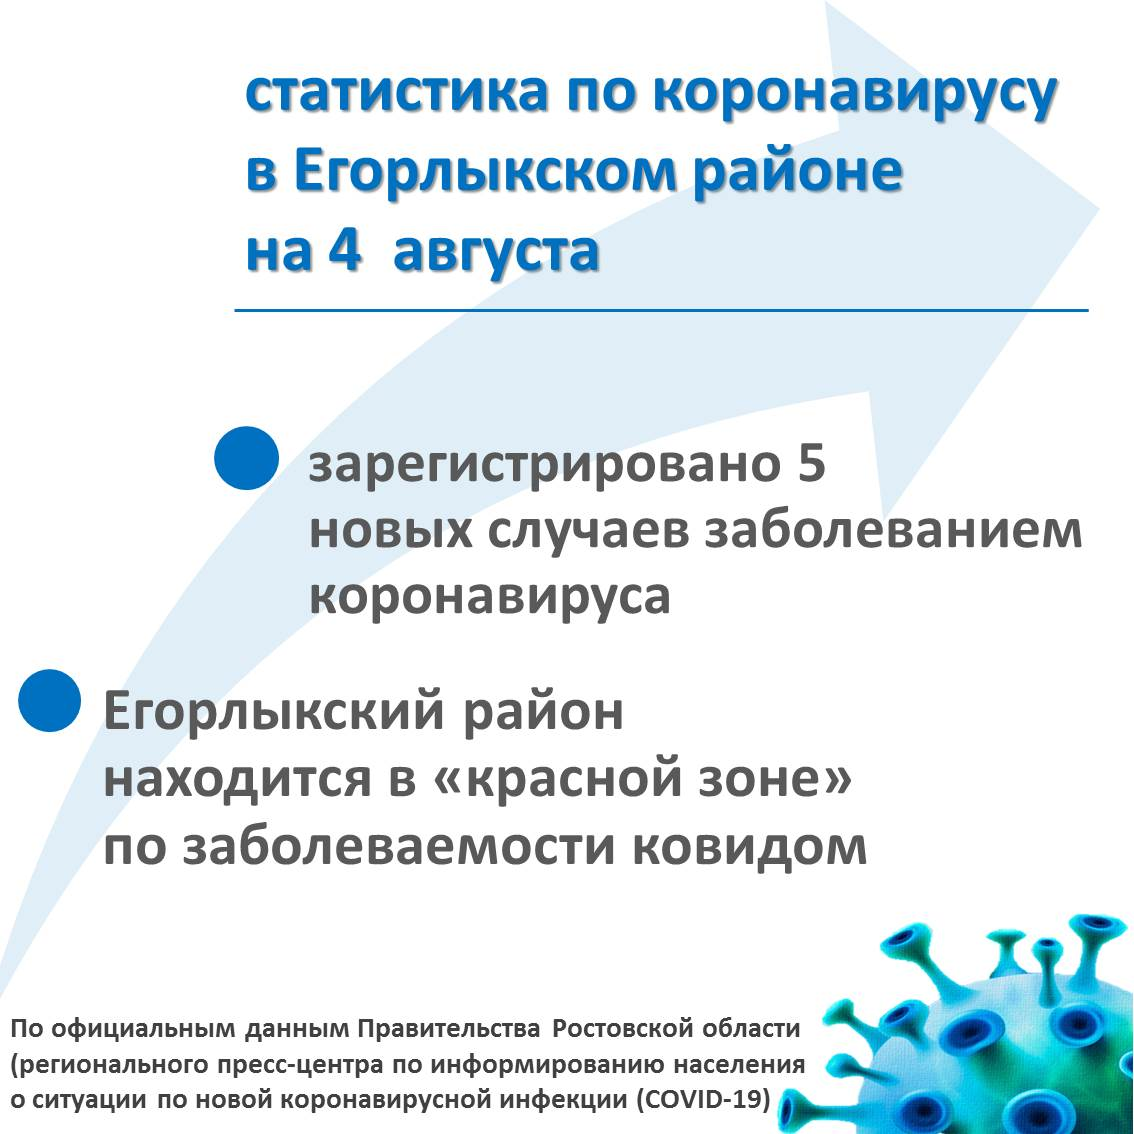 Статистика по коронавирусу в Егорлыкском районе на 4 августа